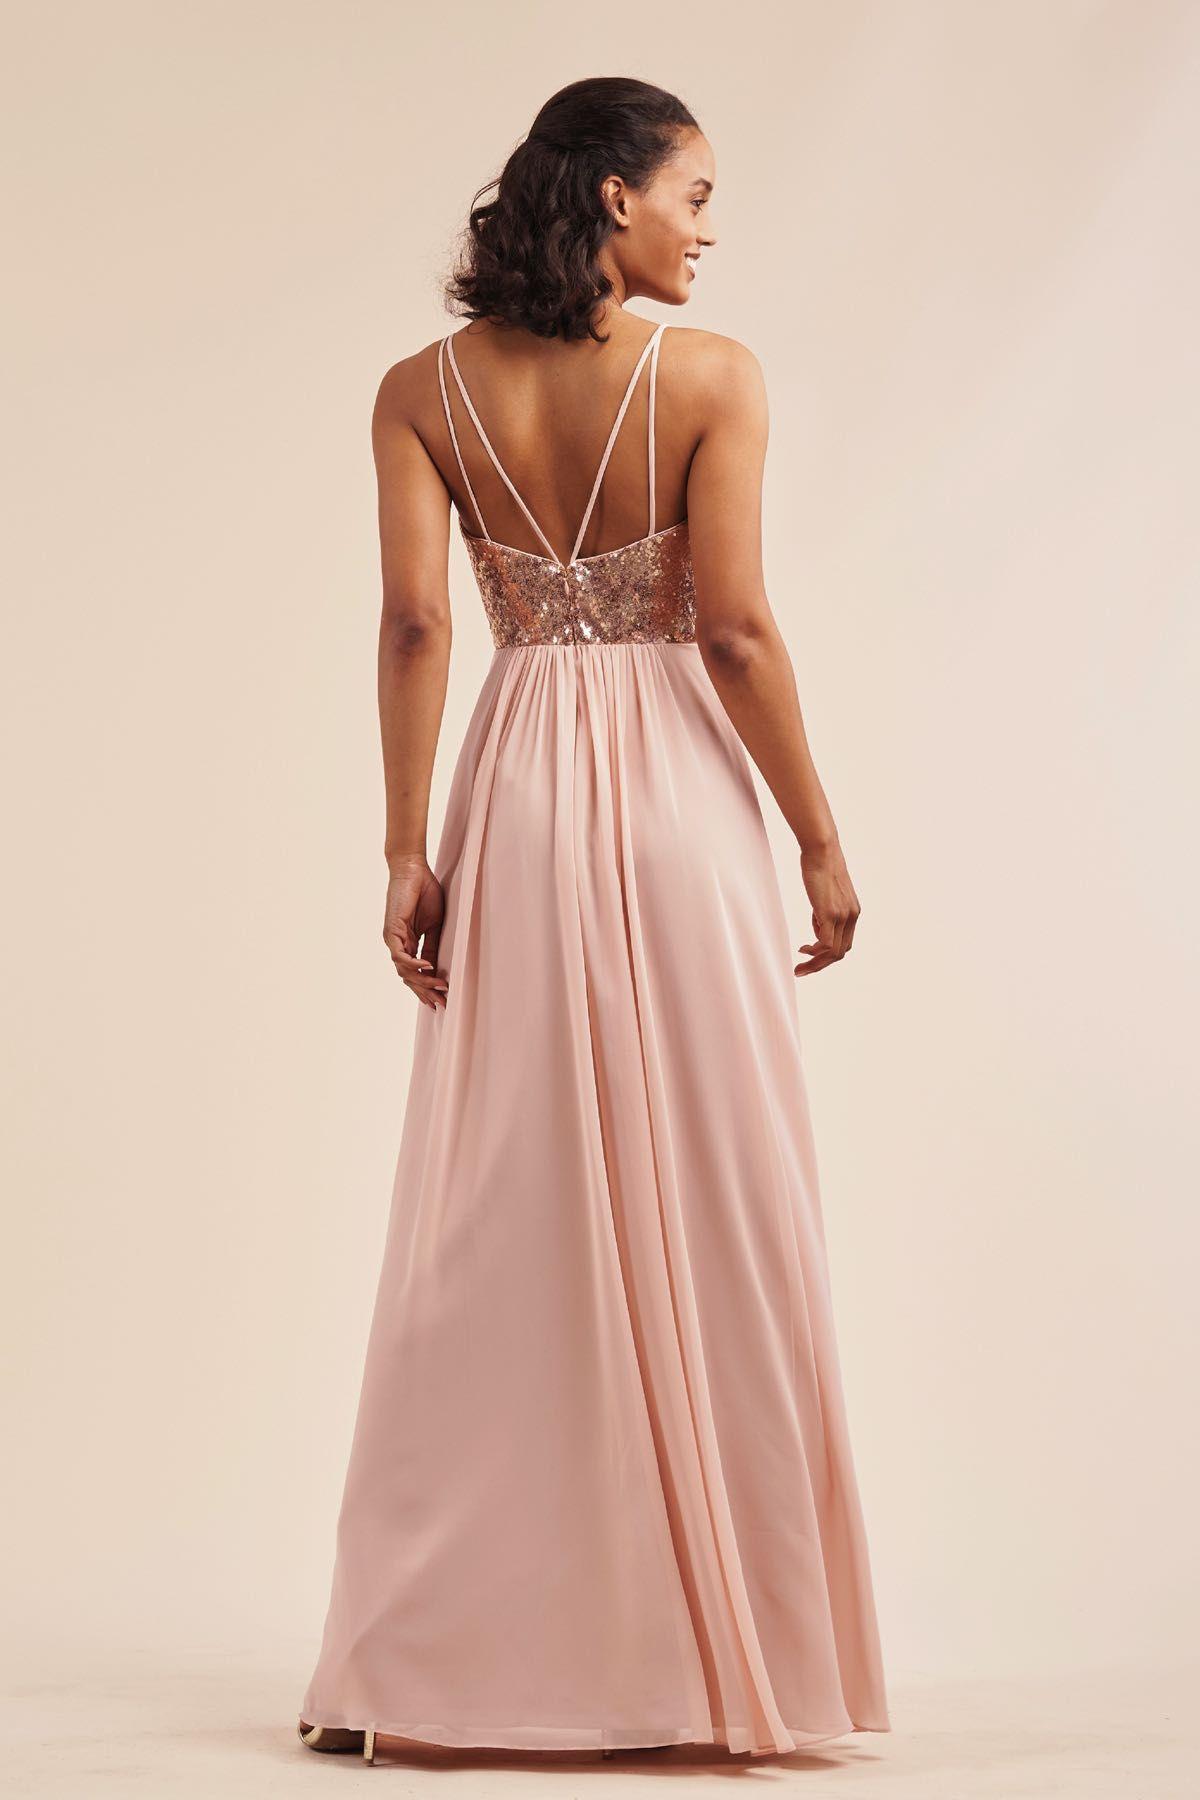 B213066 sequin poly chiffon long bridesmaid dress with v